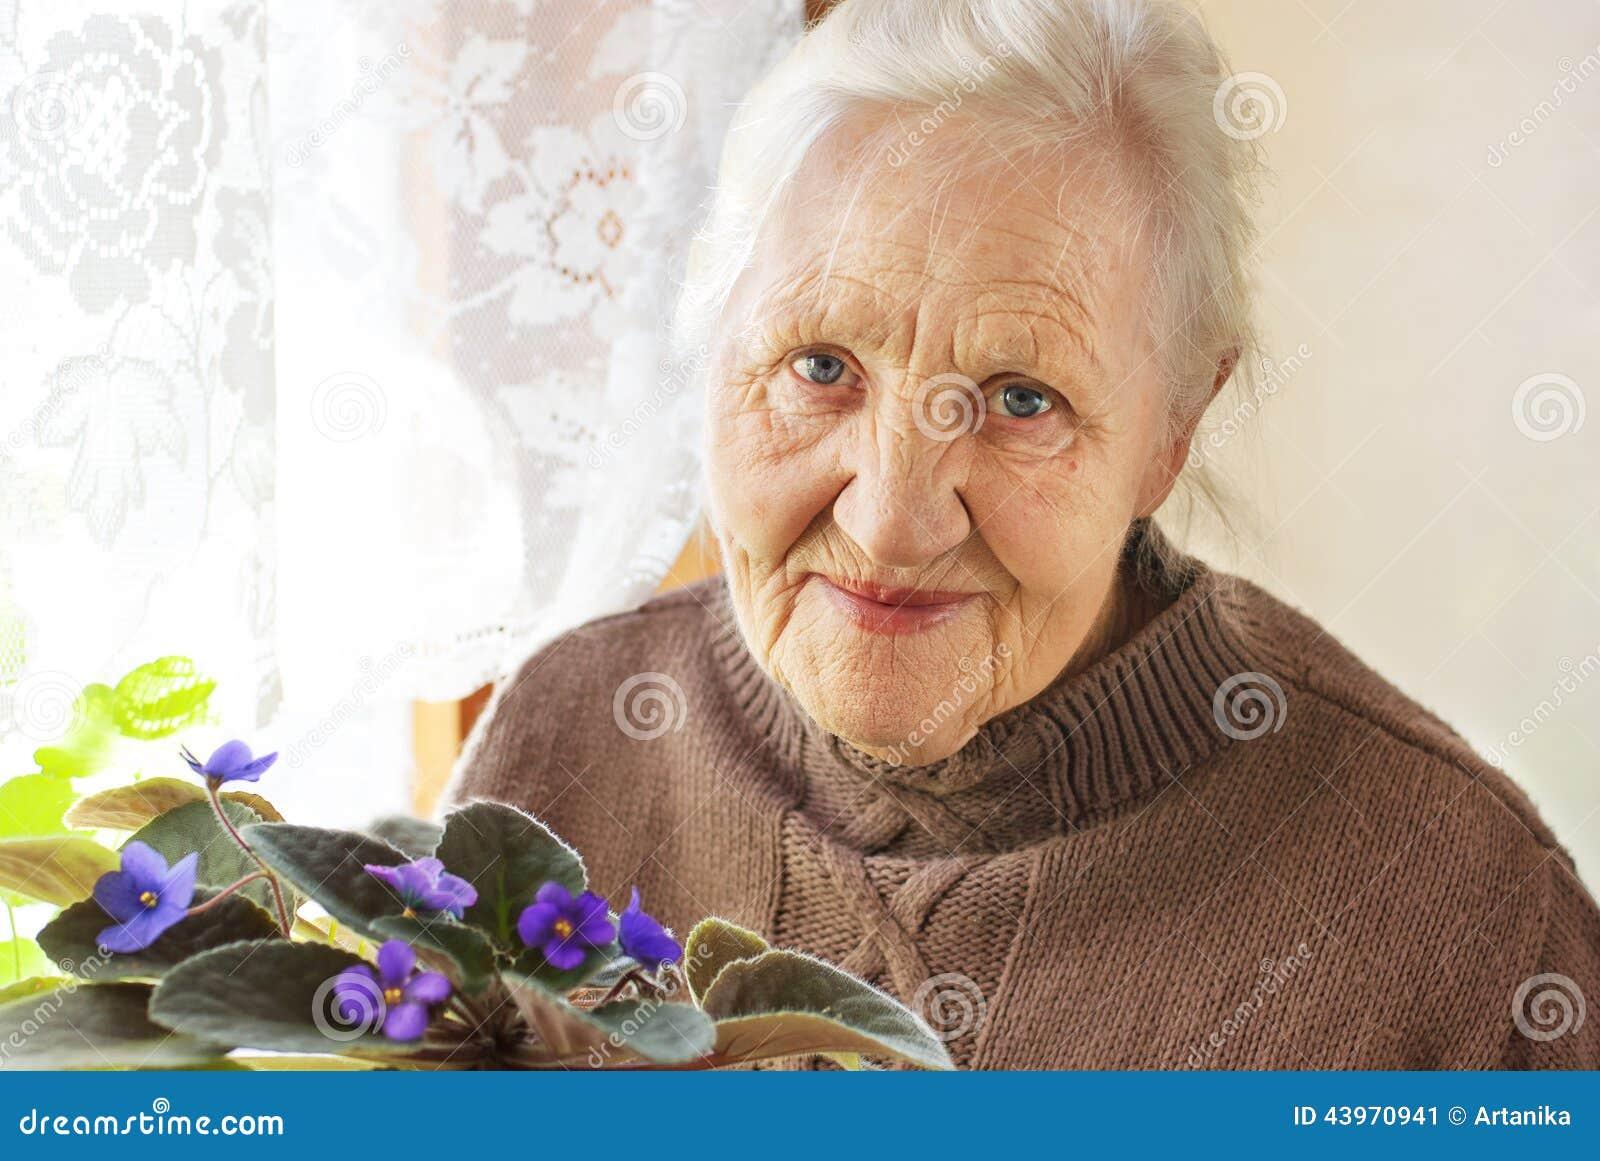 Flor idosa da mulher